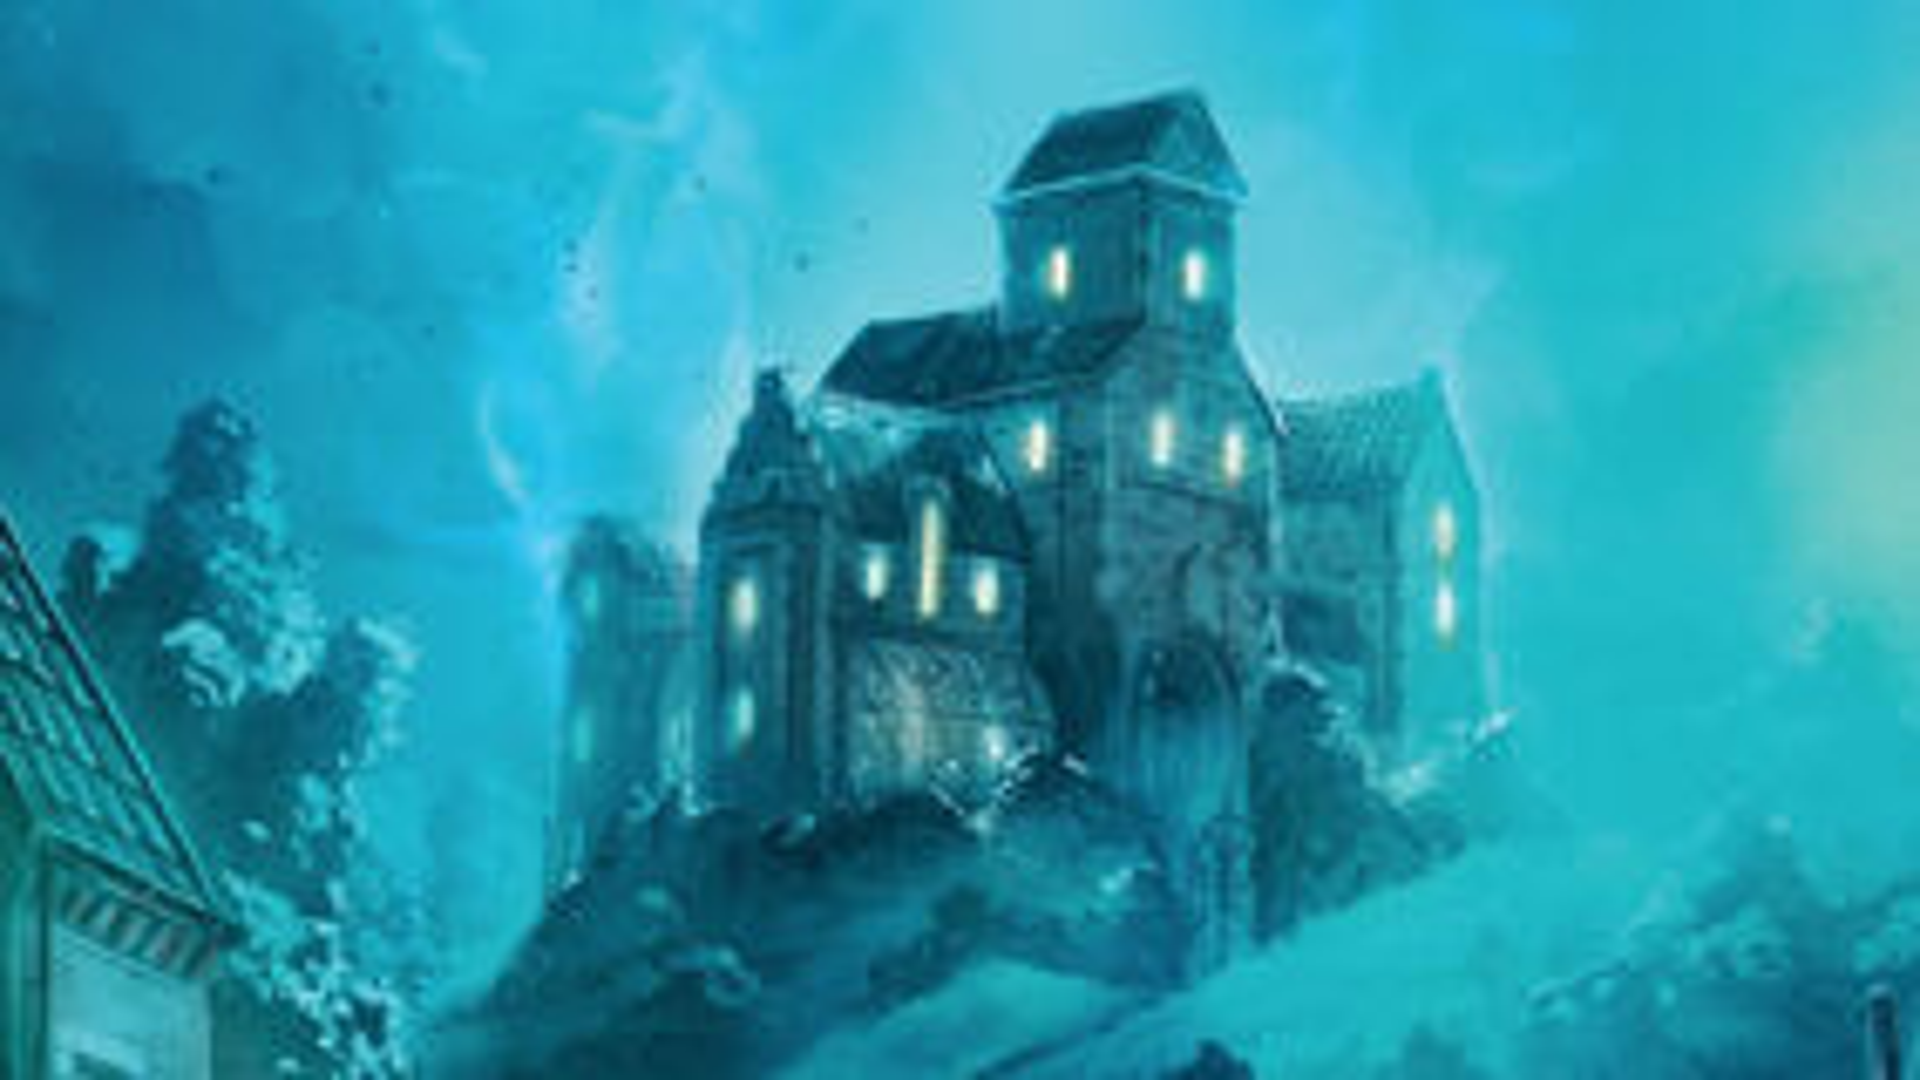 Mysterium horror board game box artwork